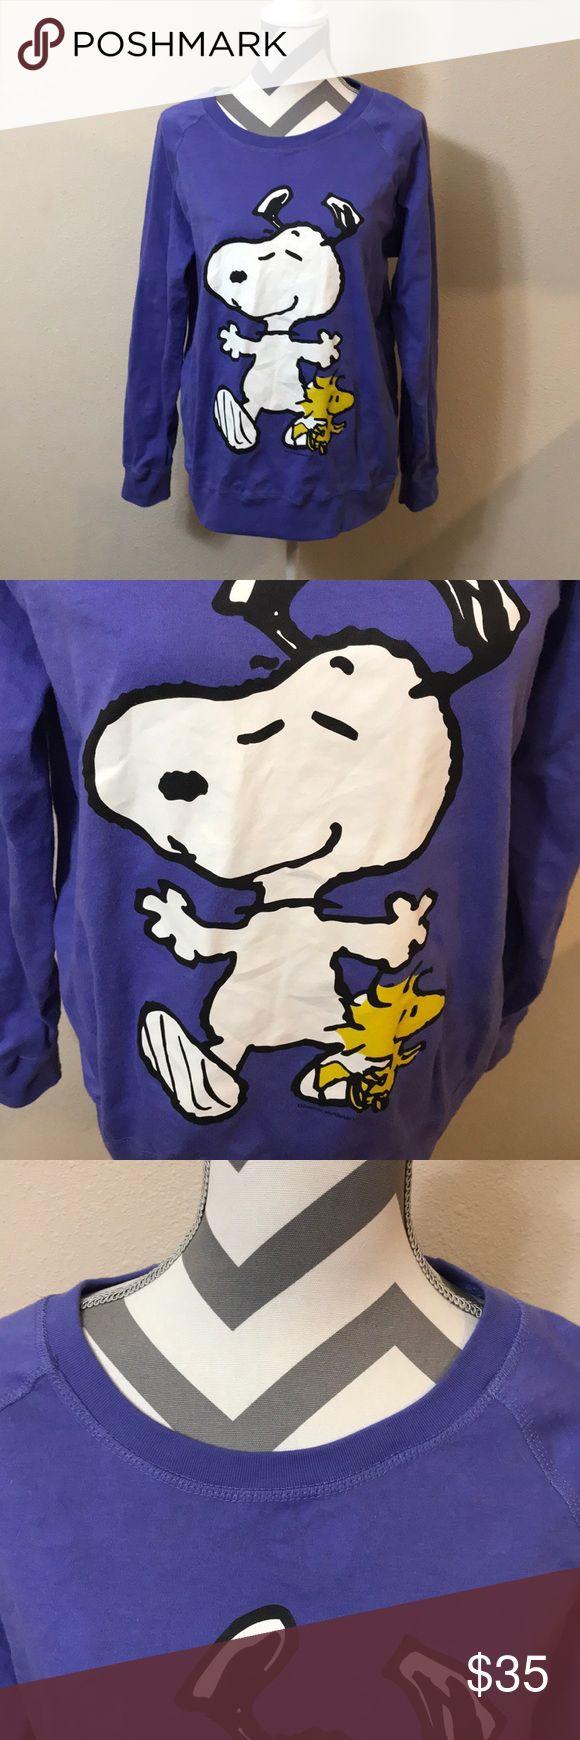 Women's Peanut Shirt- XXL Peanuts Brand shirt, size XXL (19), Excellent condition, super cute inside I️ would say makes it reversible, purple, long sleeves, crew neck, super cute shirt! Peanuts Tops